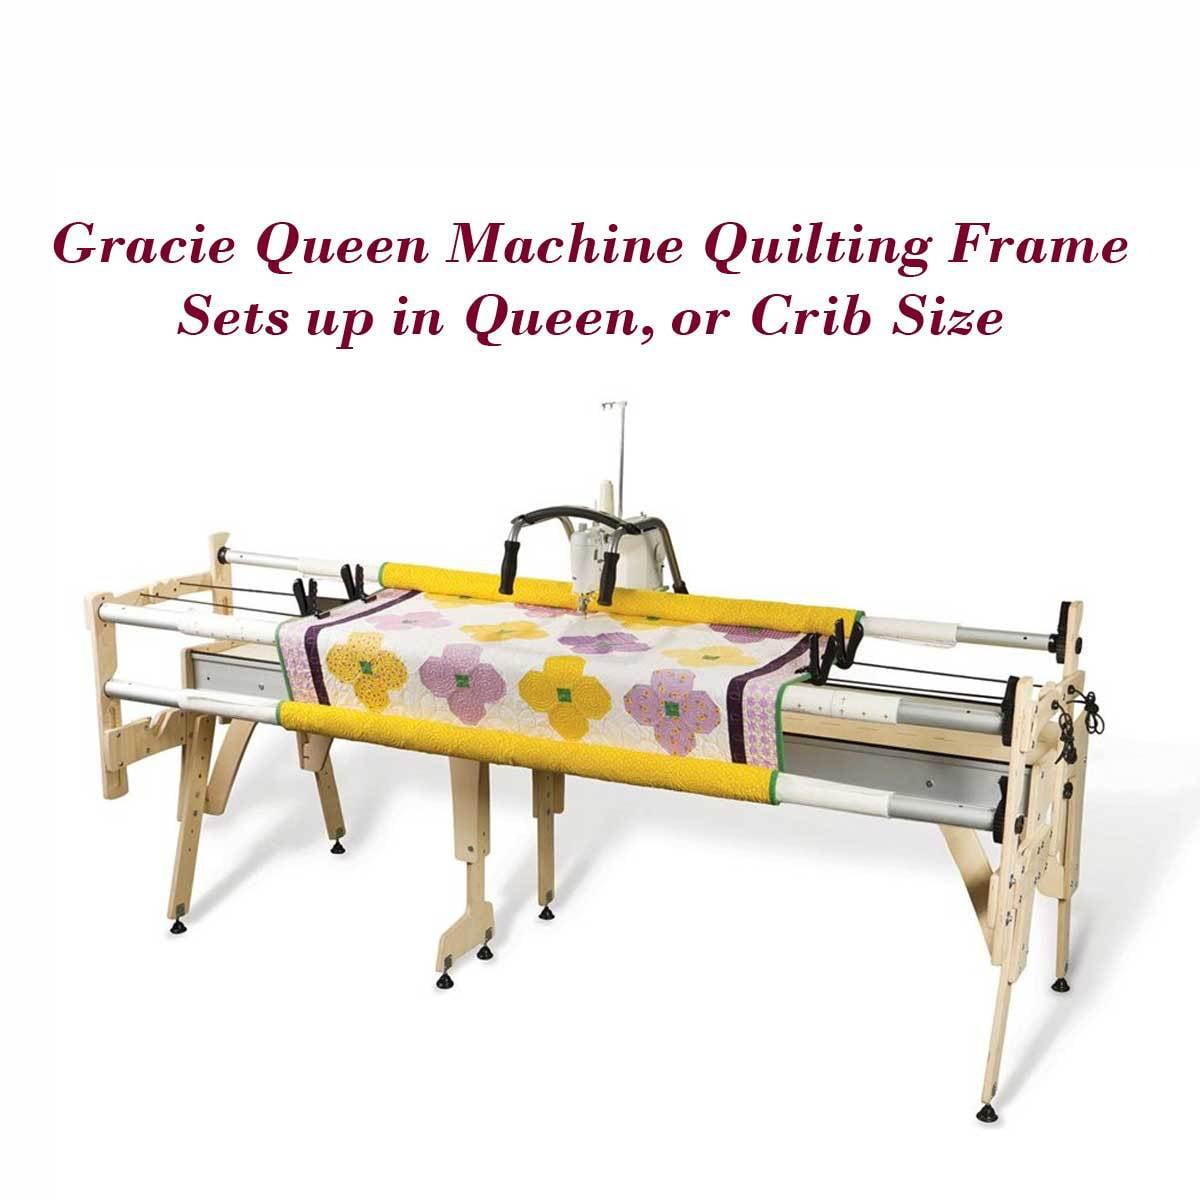 Grace Gracie Queen Machine Quilting Frame